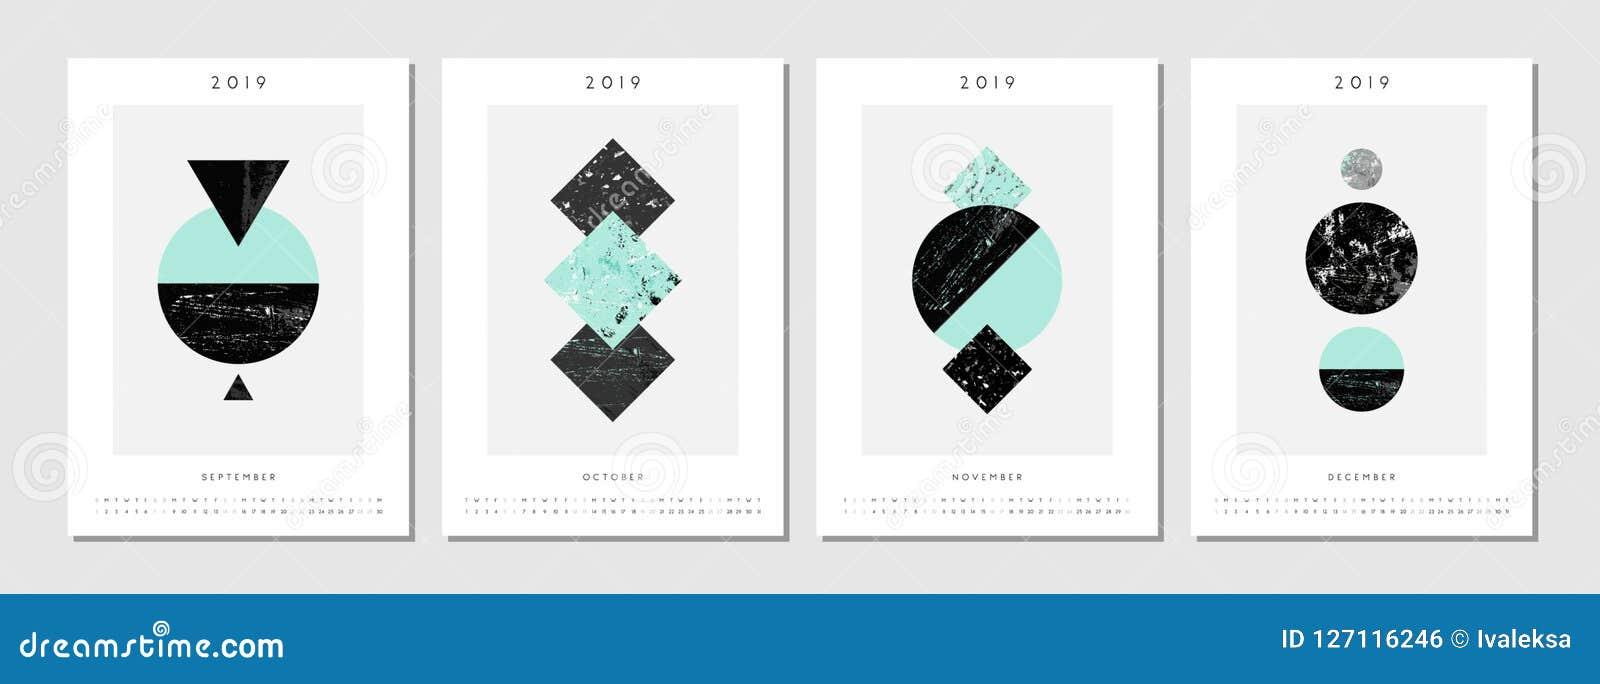 2019 Four Month Printable Calendar Template Stock Vector